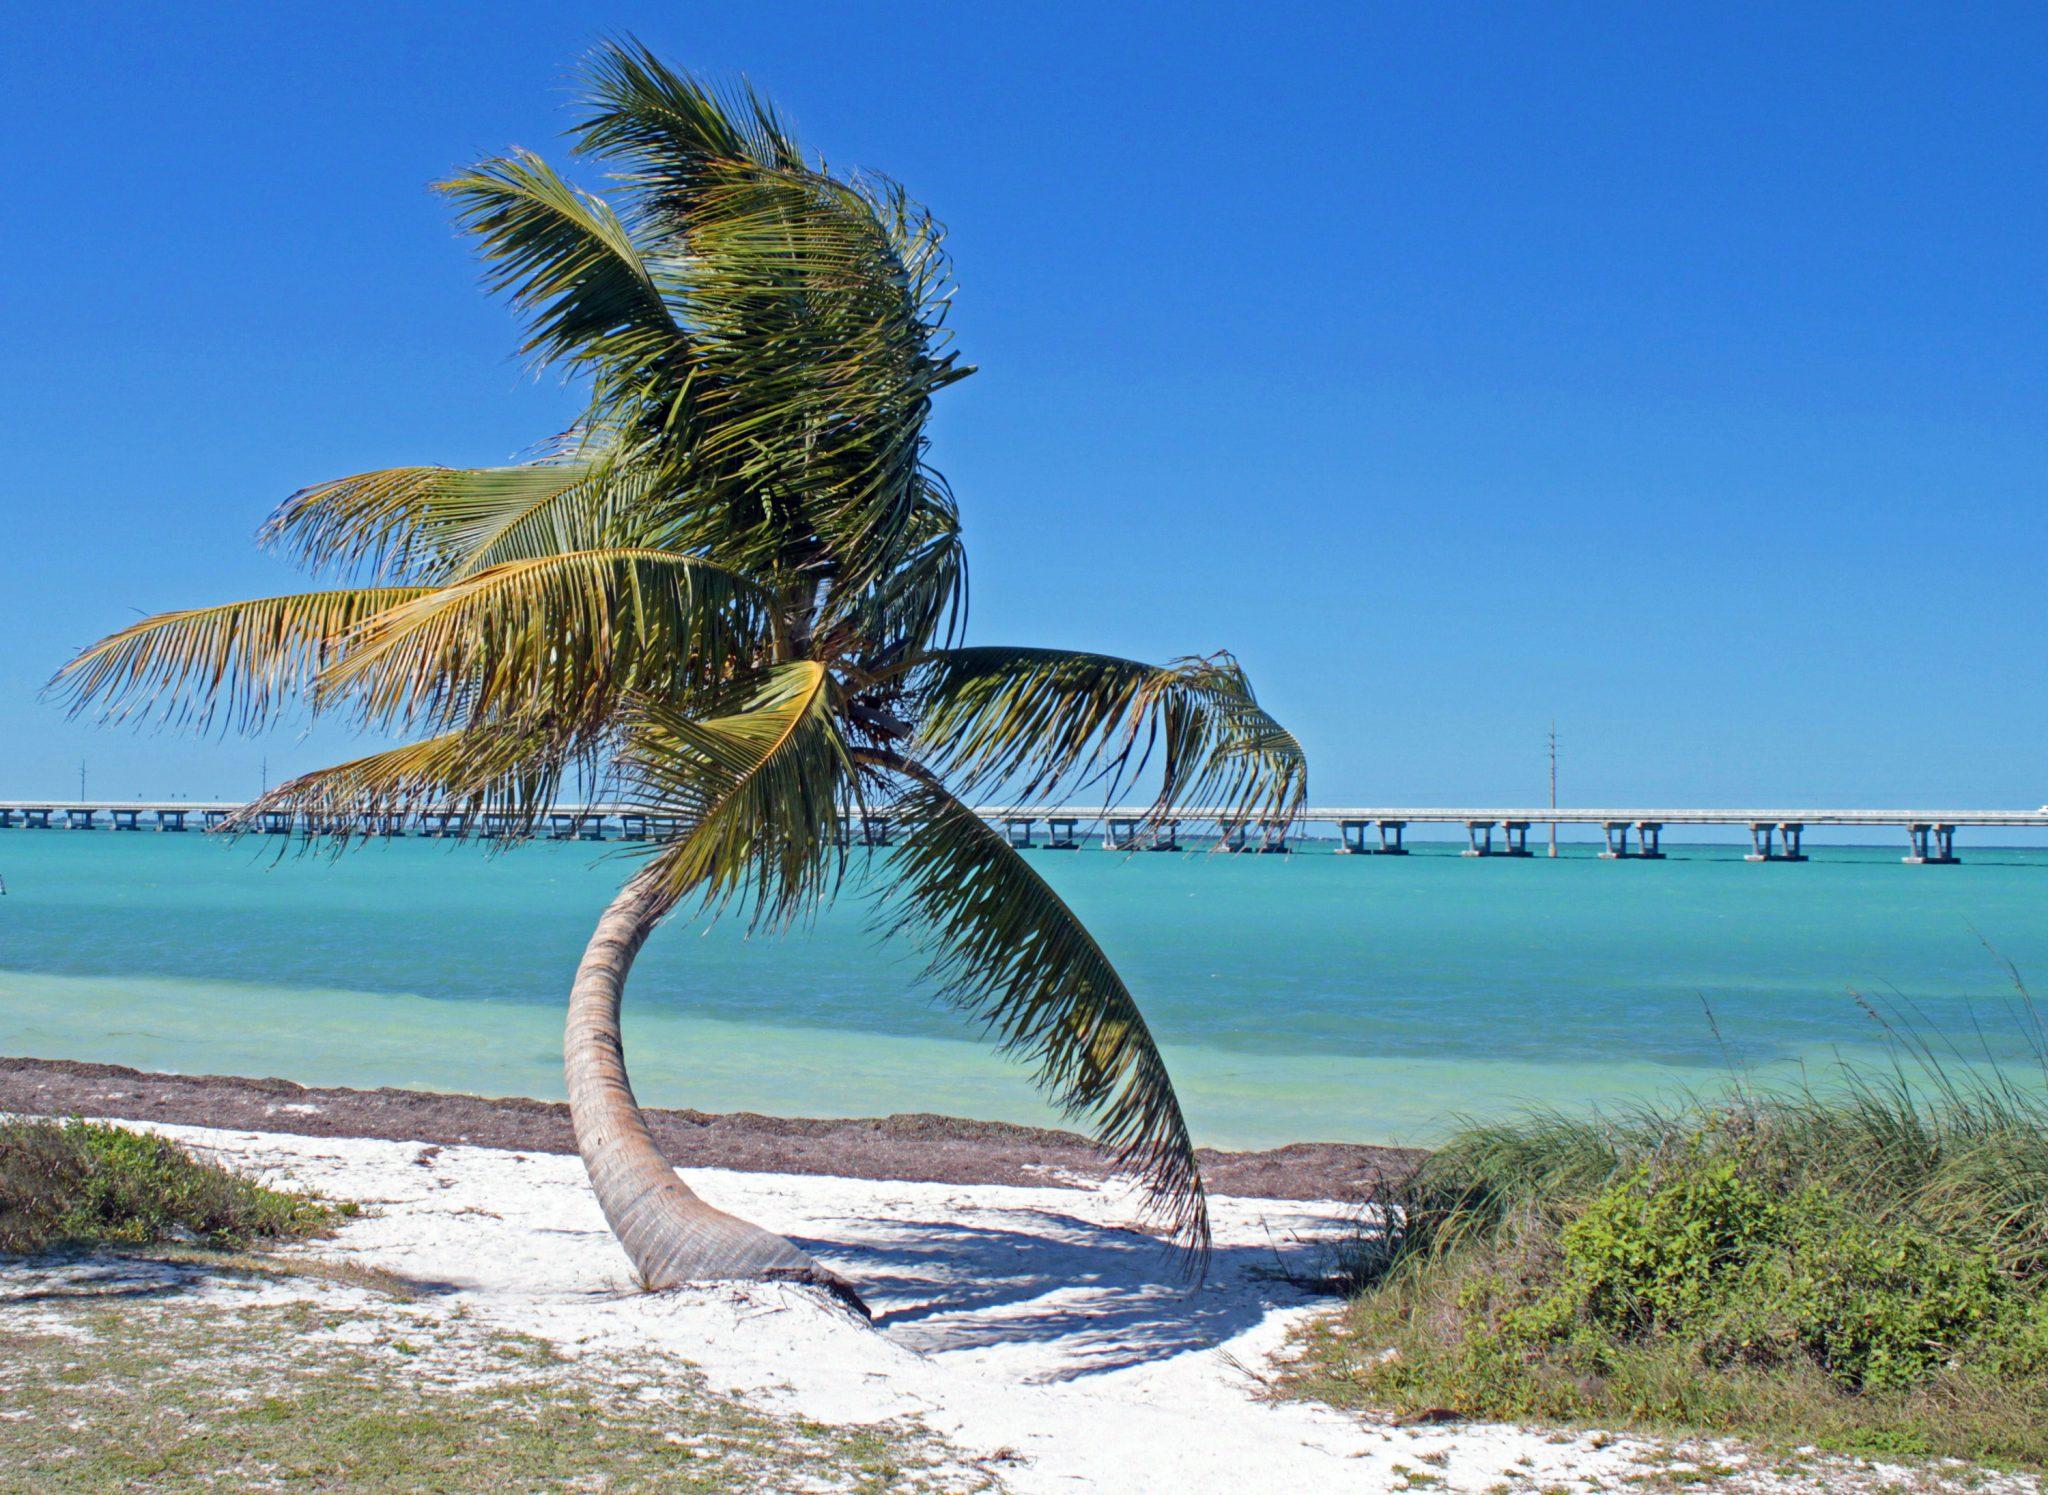 Road Trip Planner to the FL Keys